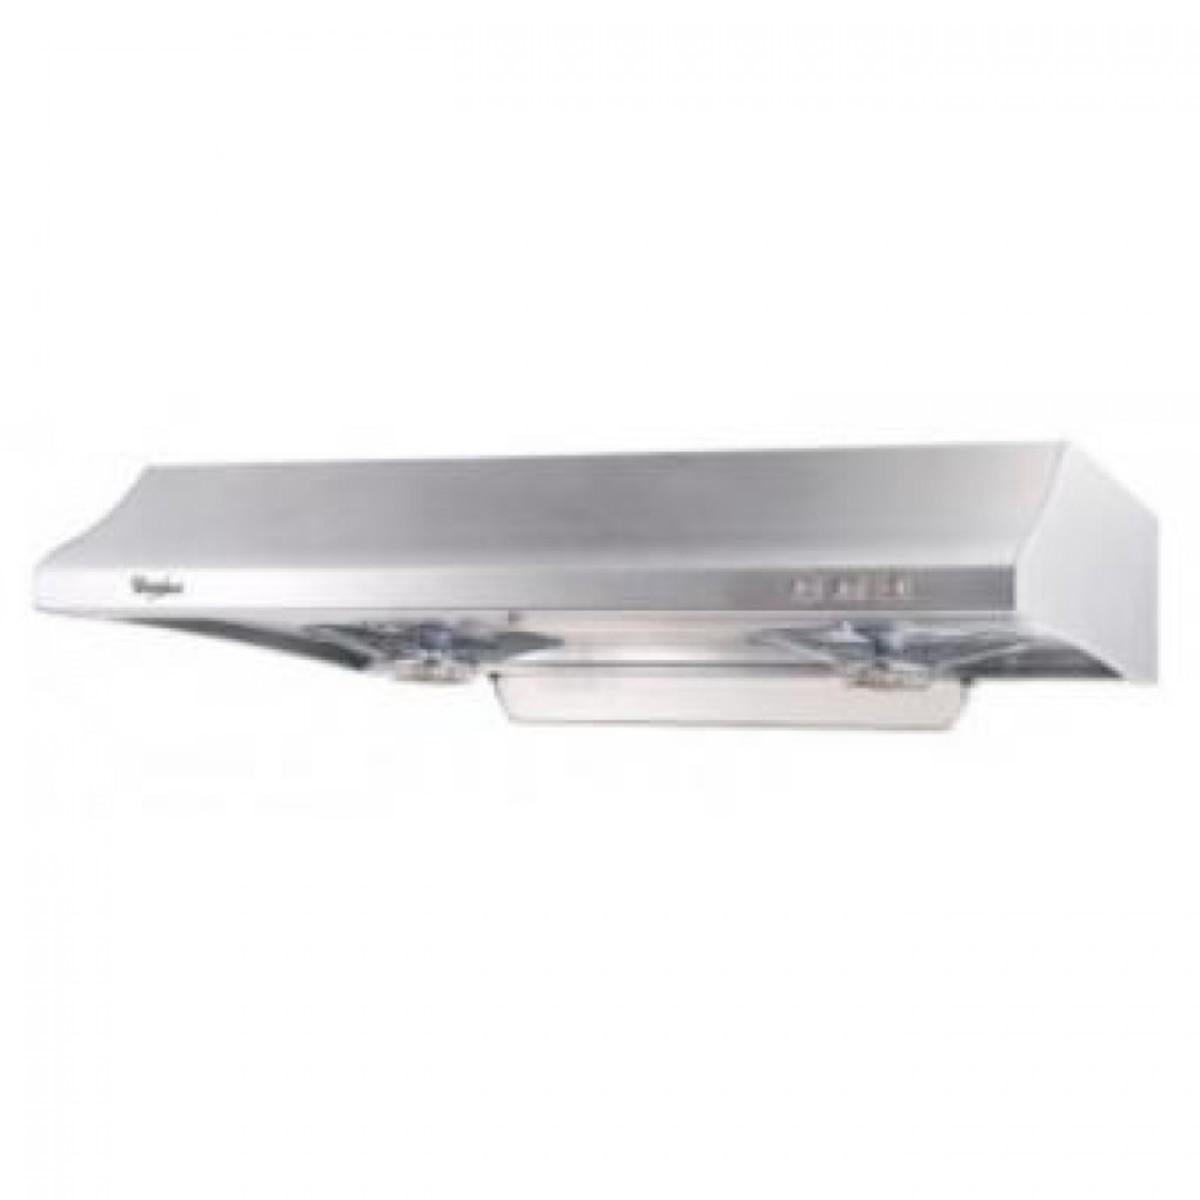 HE438S 710mm Detachable Cooker Hood (Stainless steel) - 1-year Whirlpool Warranty